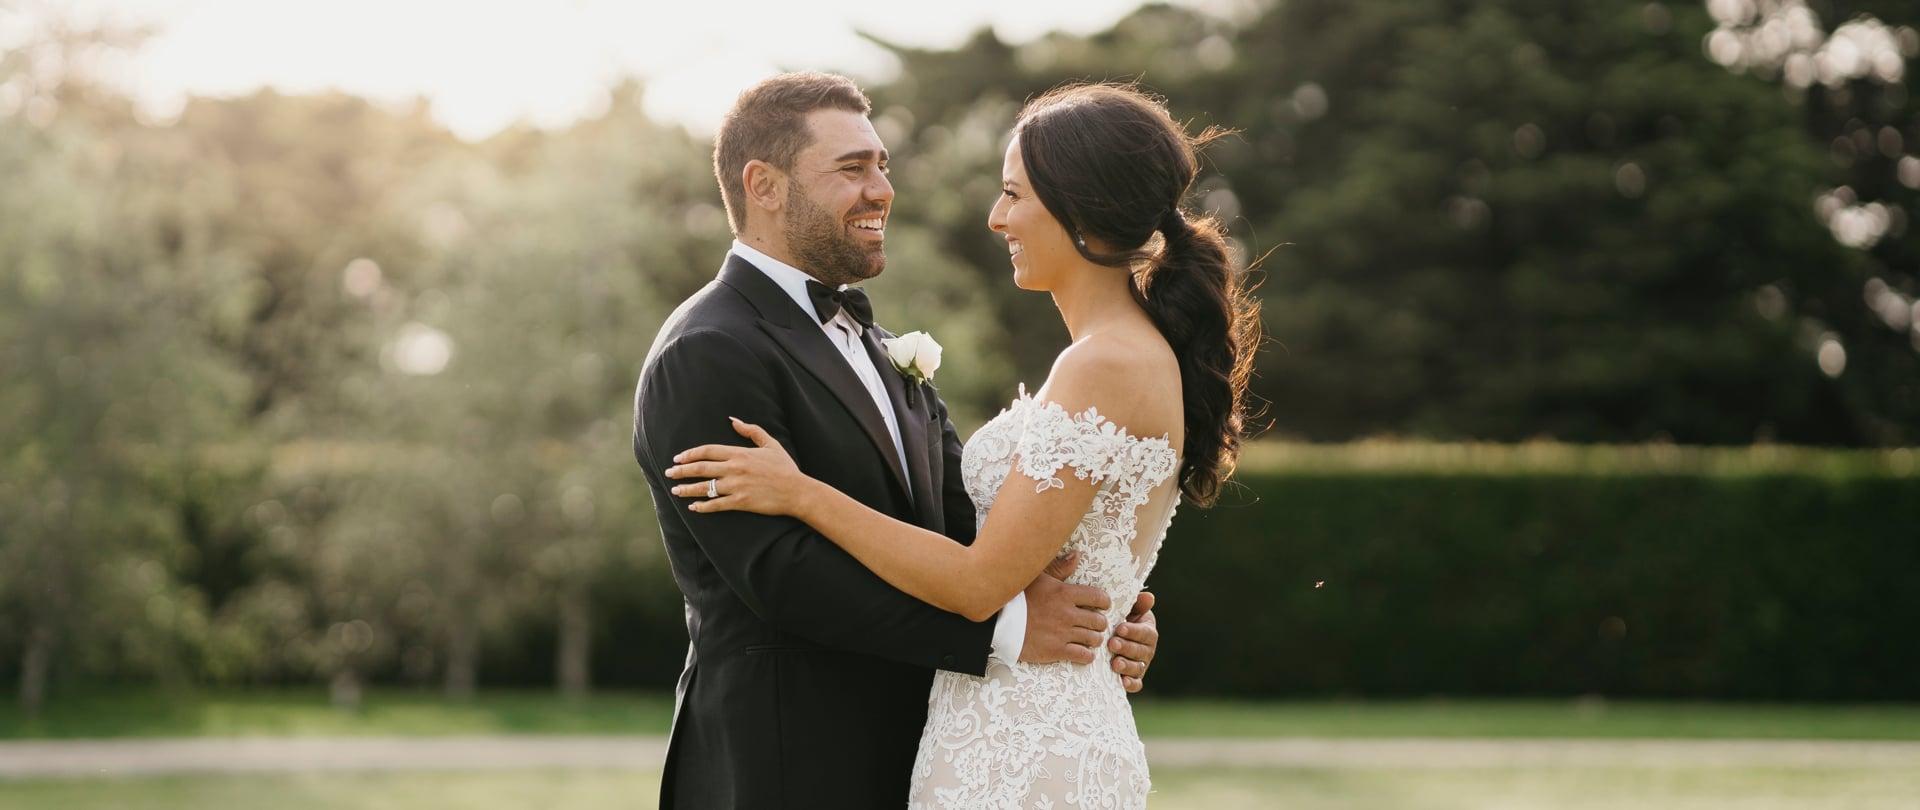 Taryn & Anthony Wedding Video Filmed at Yarra Valley, Victoria